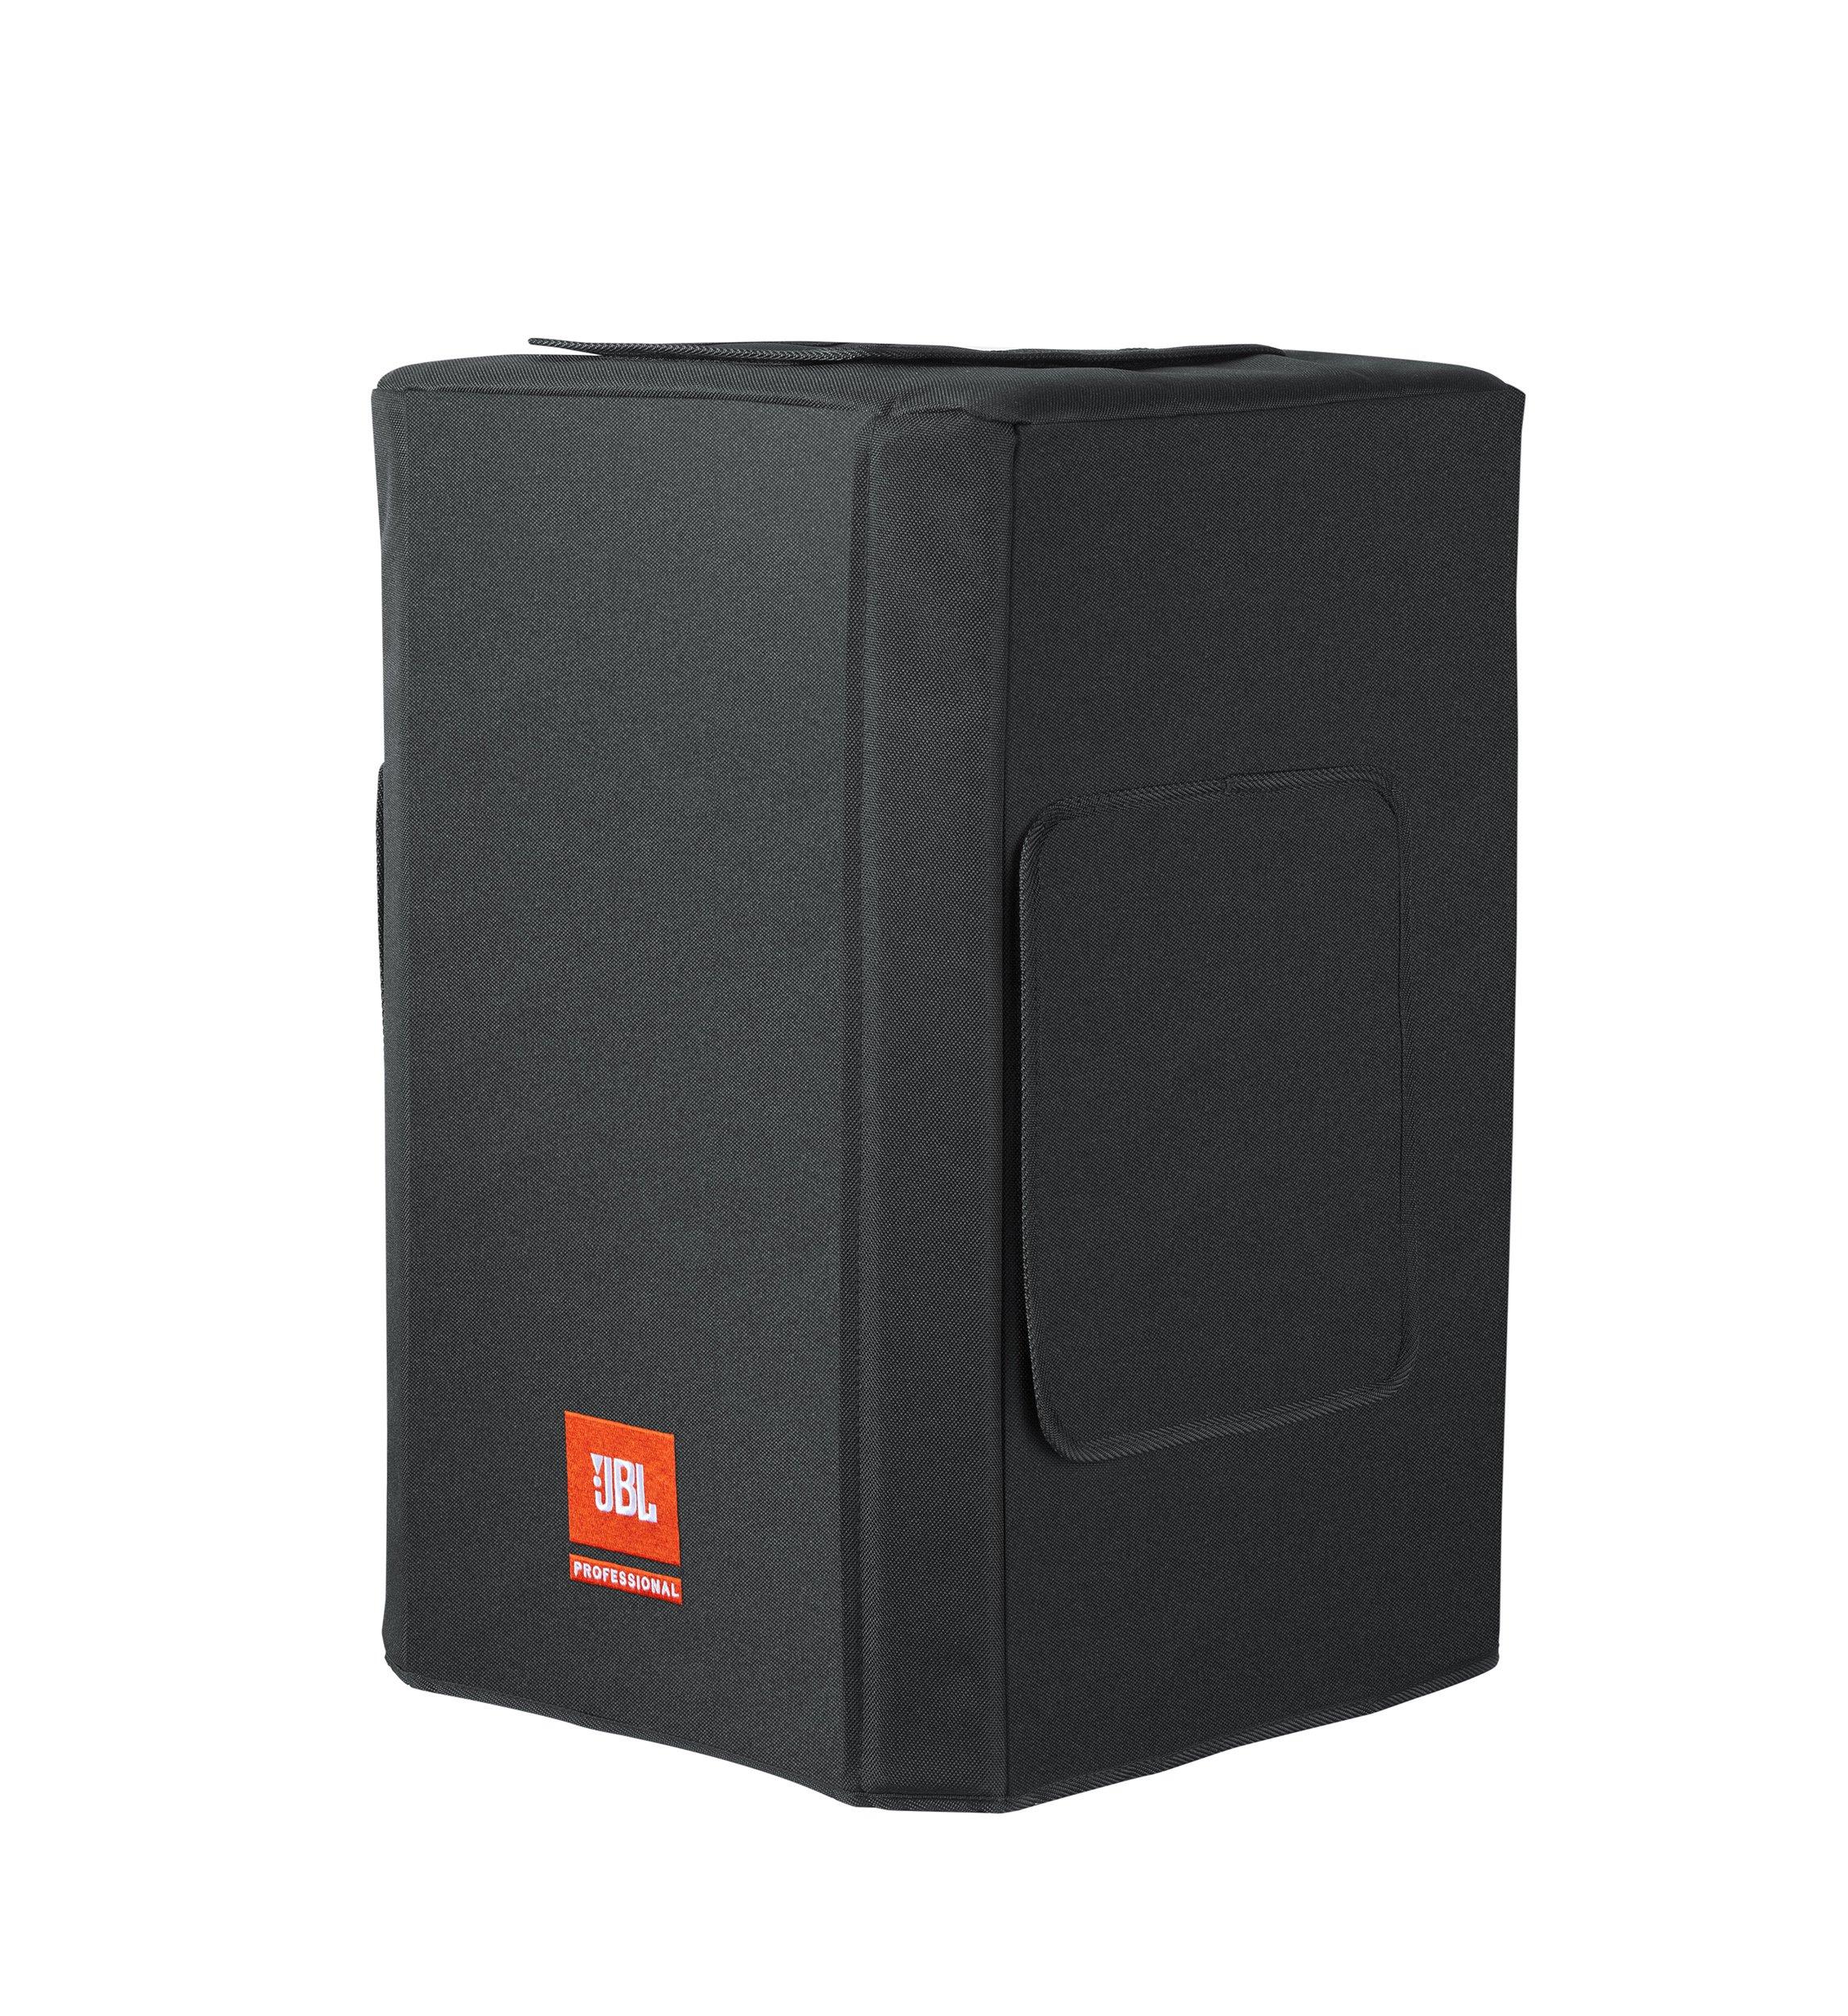 JBL Bags SRX812P-CVR-DLX Deluxe Padded Protective Cover for SRX812P-CVR